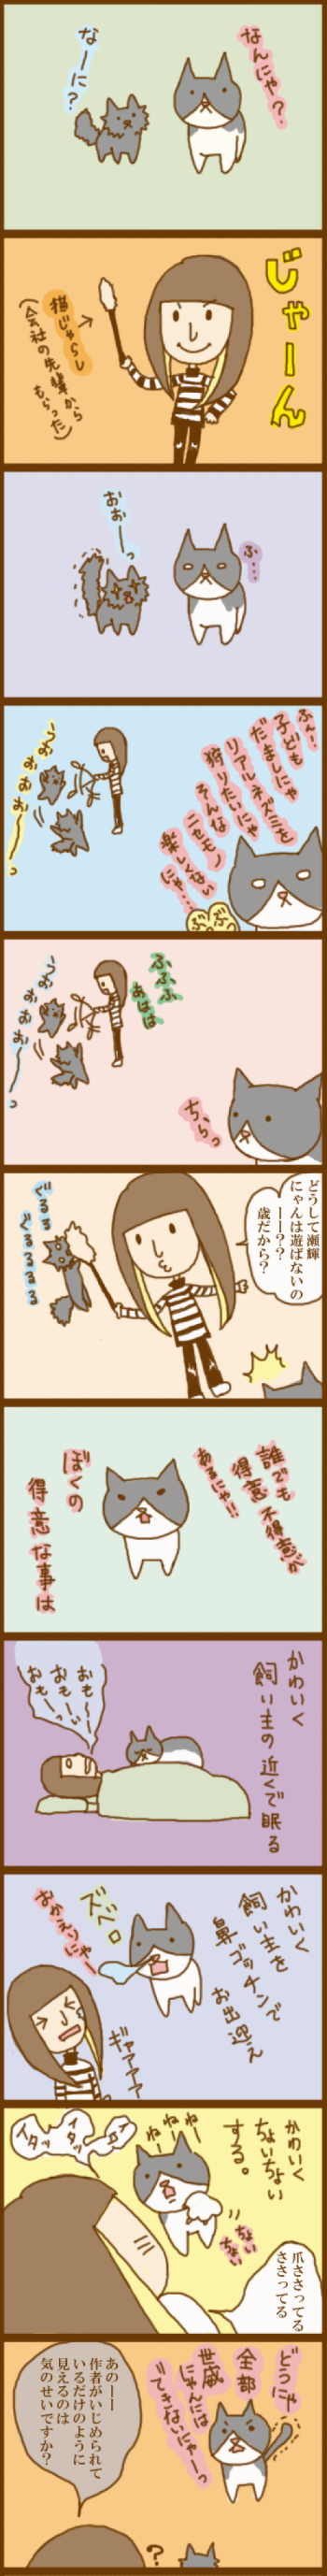 f:id:suzuokayu:20201017211011j:plain